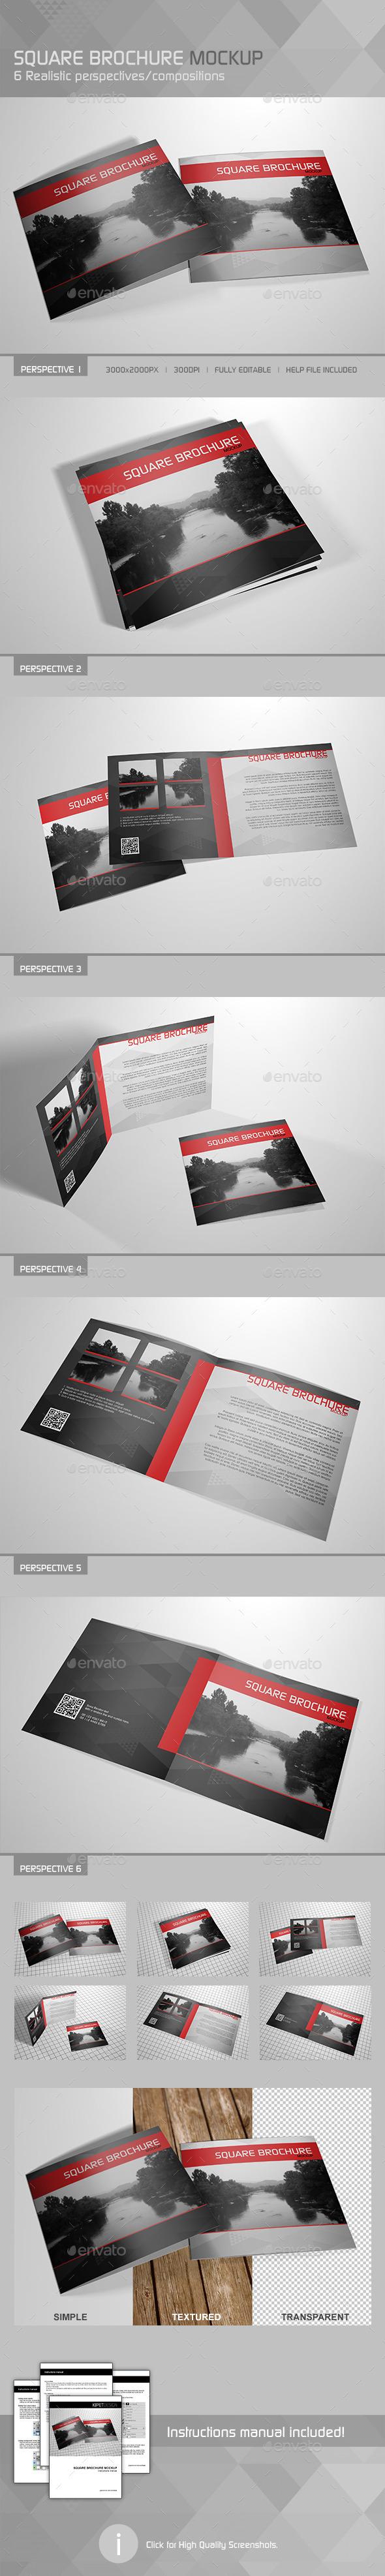 Realistic Square Brochure Mockup - Brochures Print